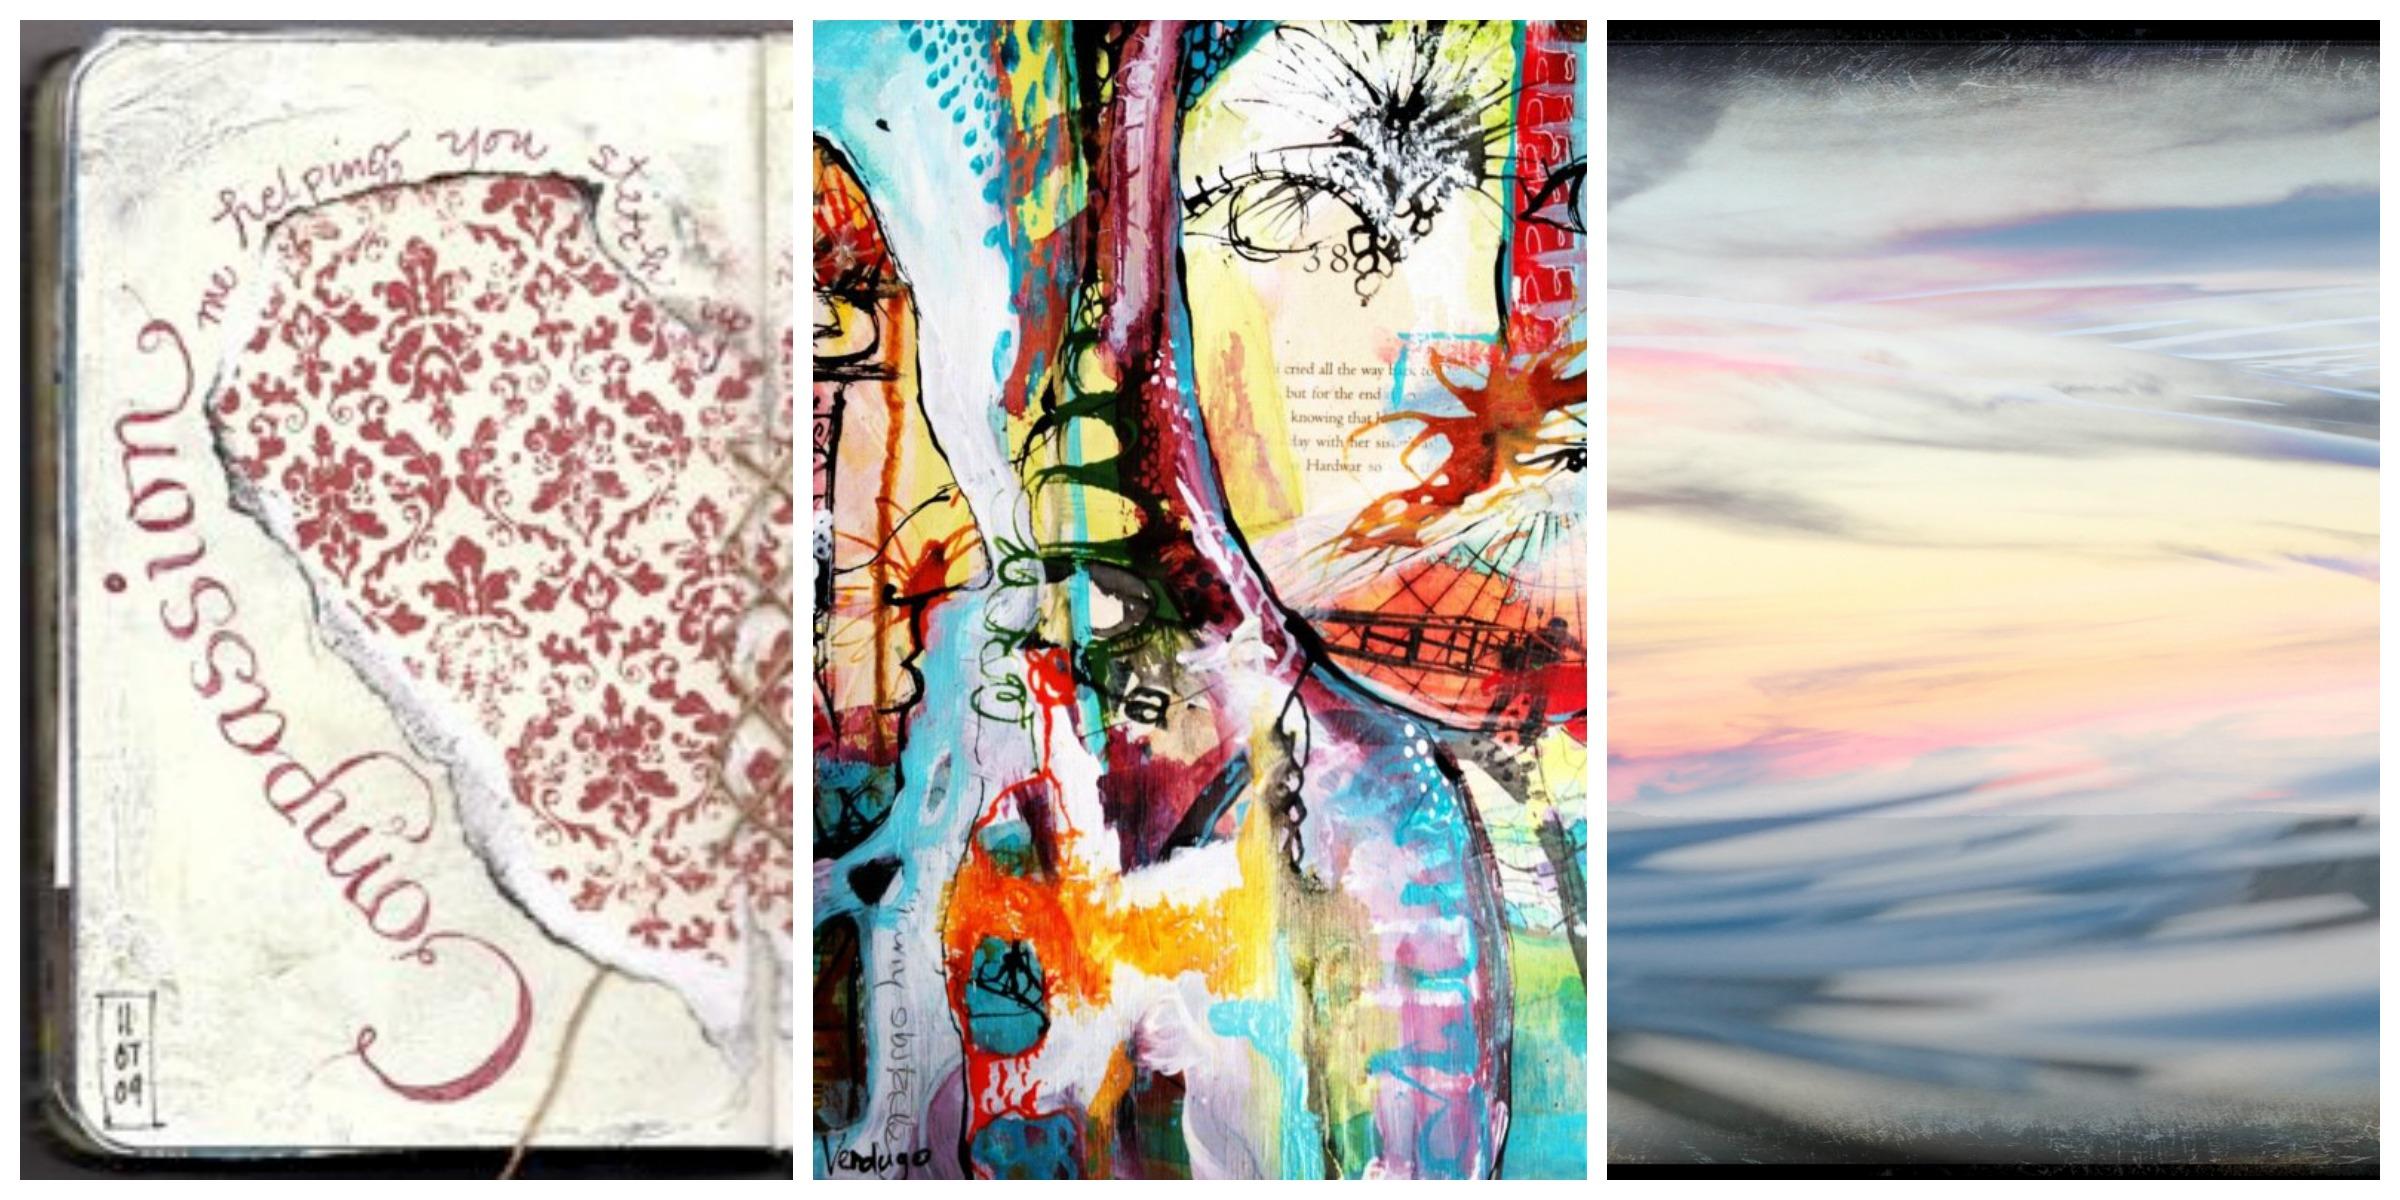 Art by Spectrum contributors Betsy Canas Garmon, Tracy Verdugo and Lisa Wilson